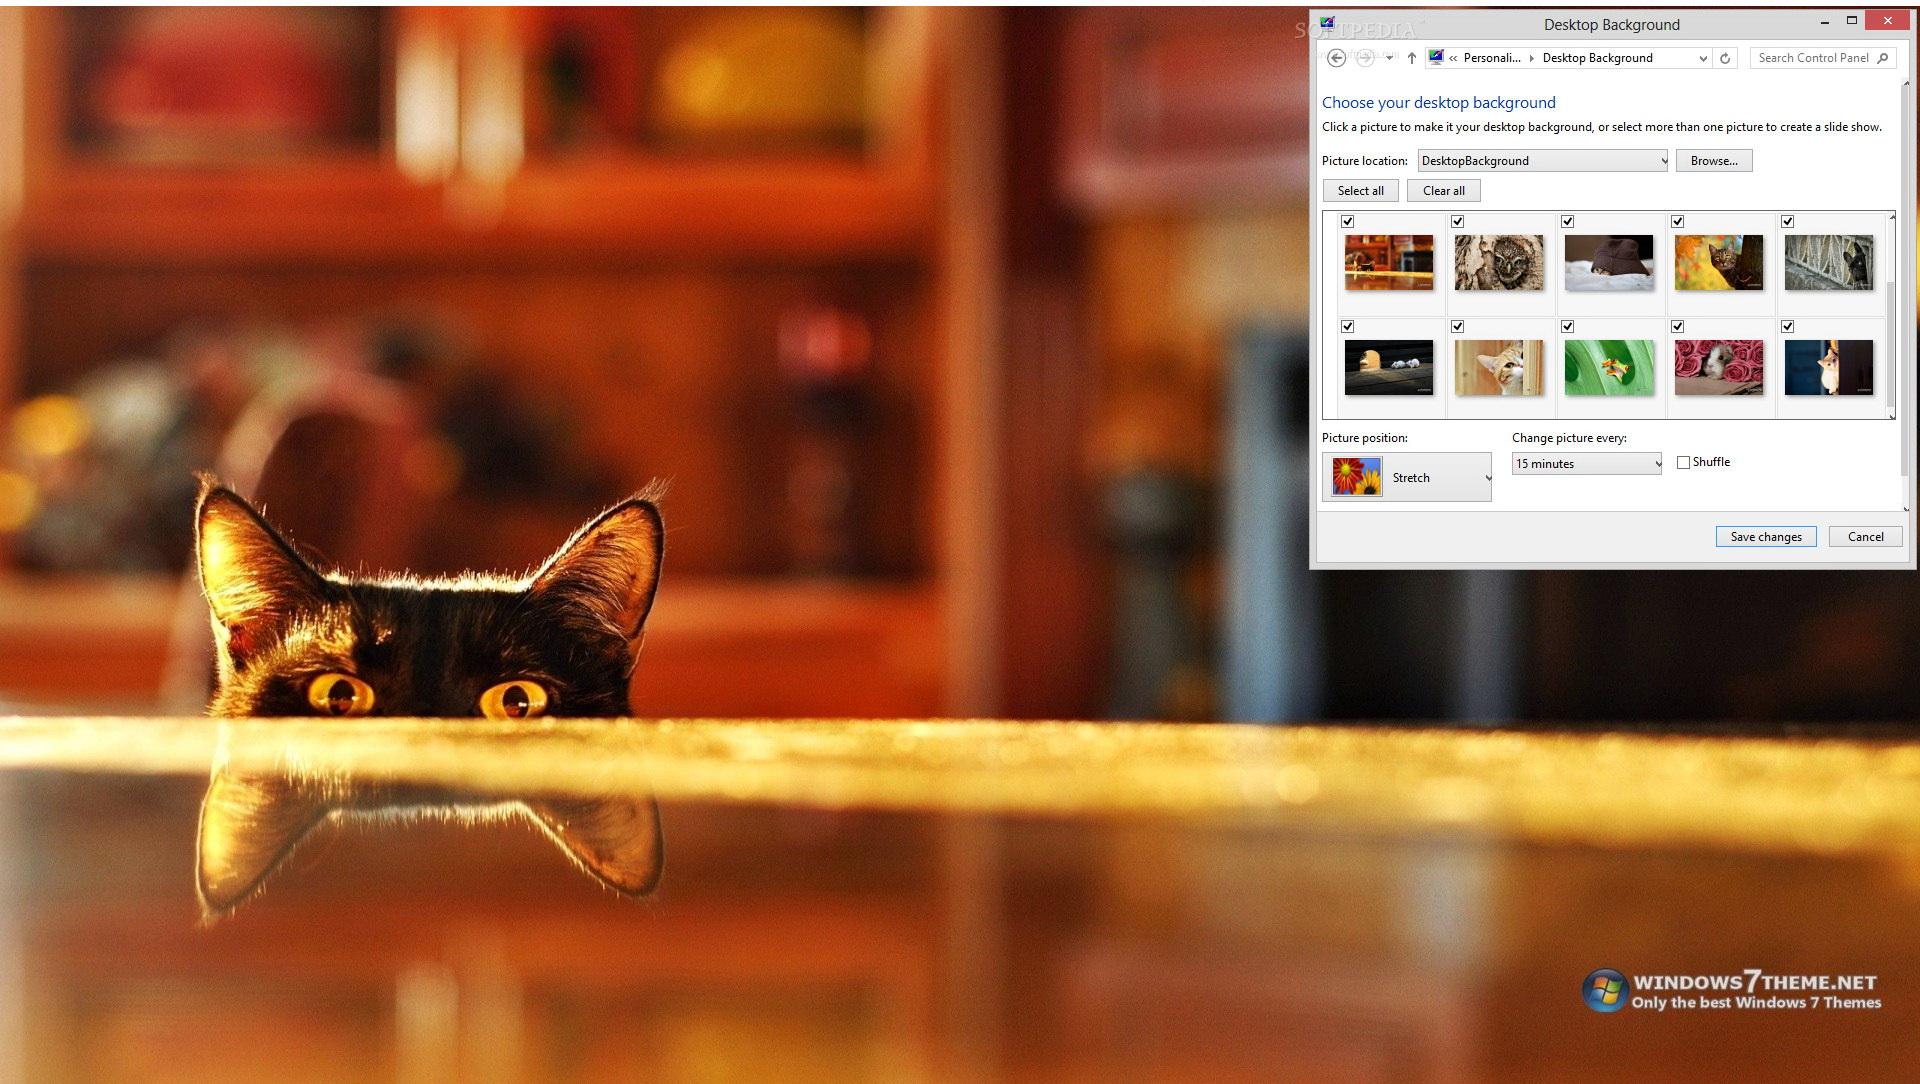 Peeping Animals Windows 7 Theme